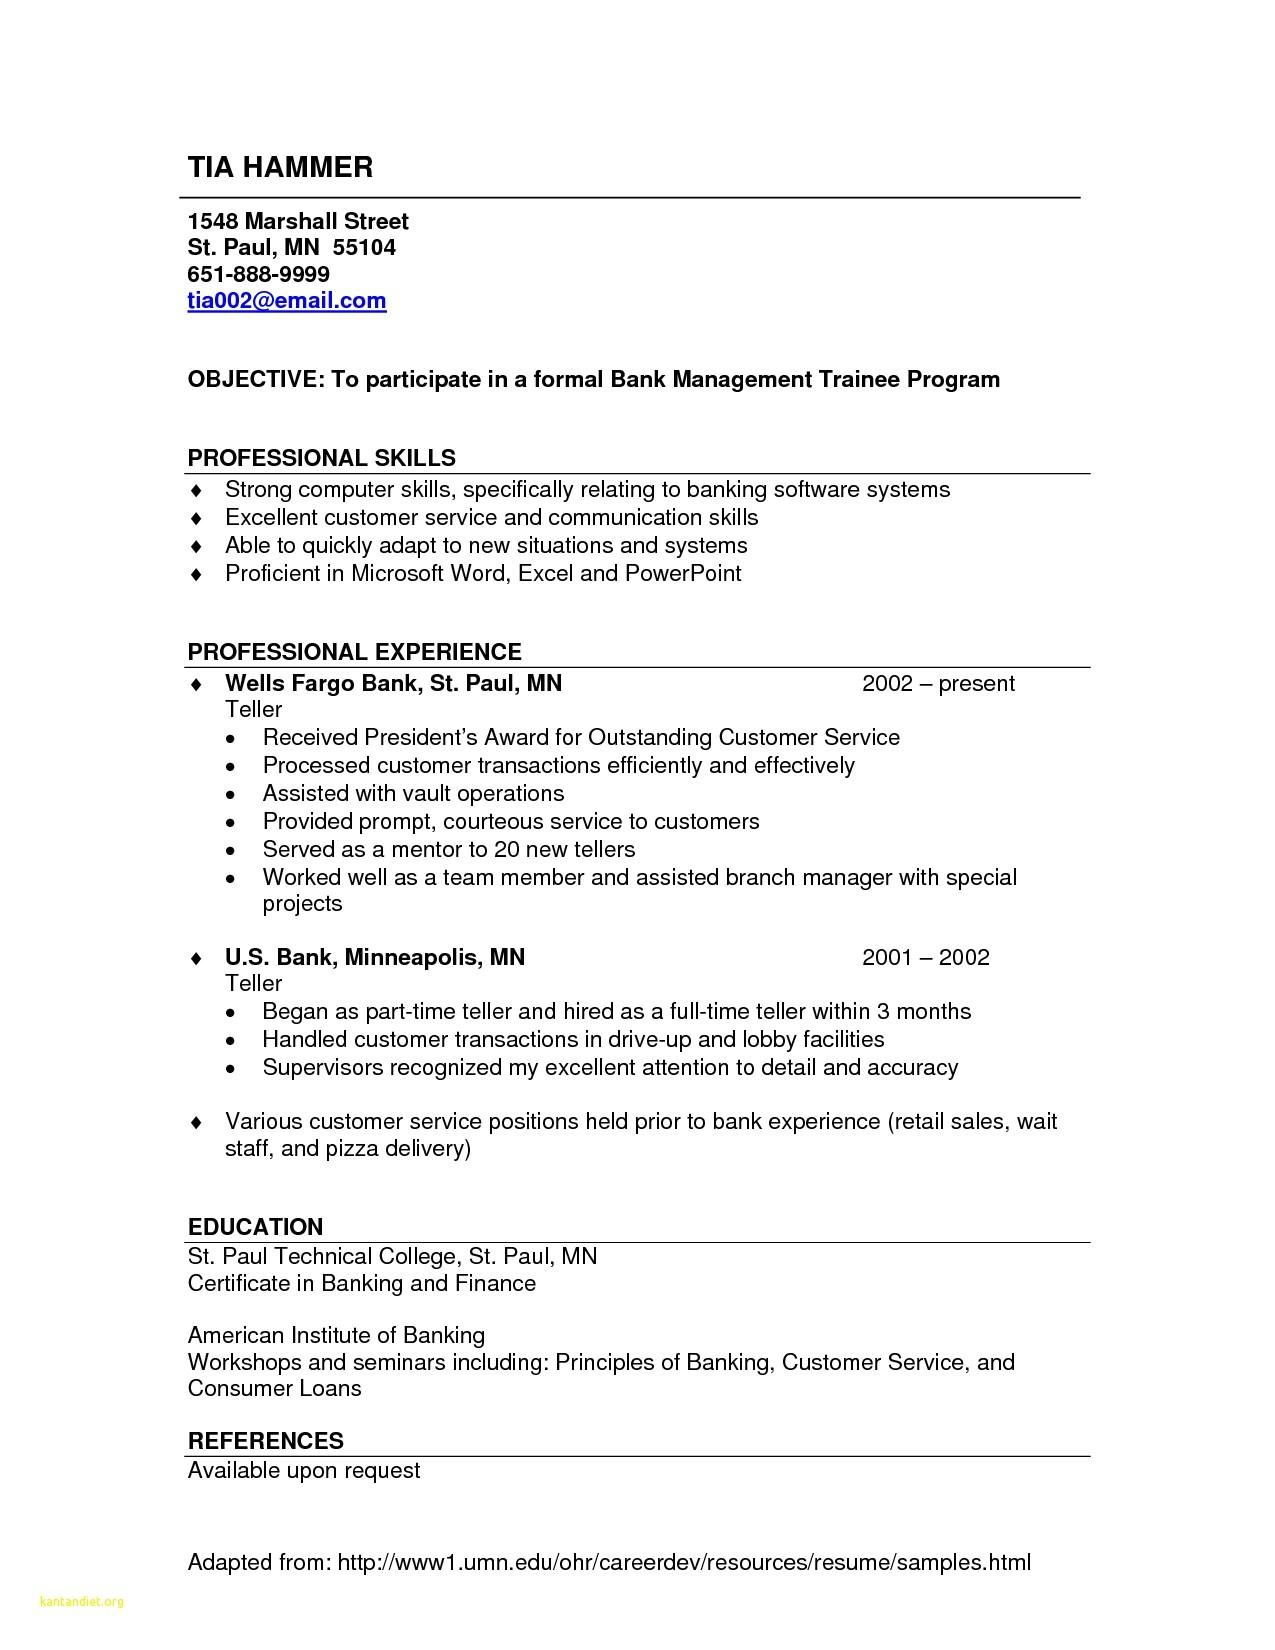 Bank Teller Resume Templates No Experience Fresh Bank Teller Sample Resume Professional Resume